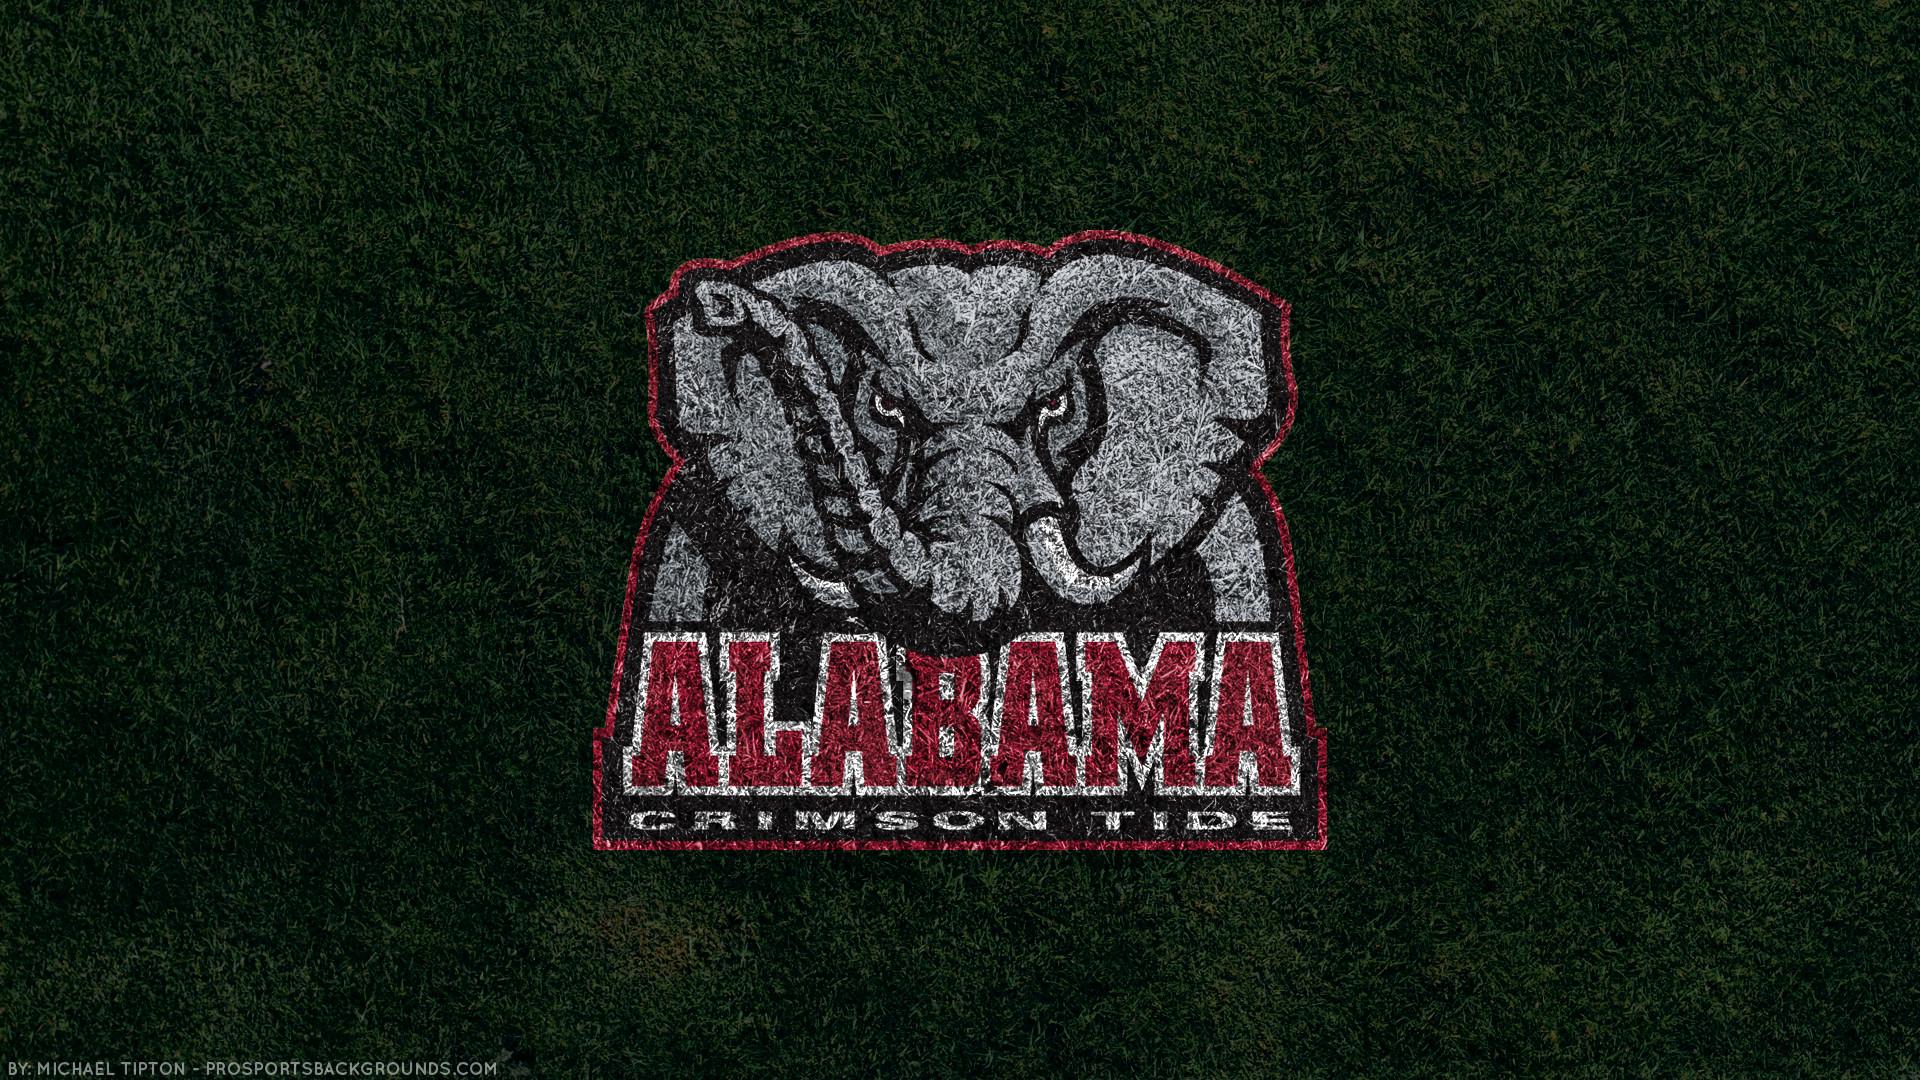 Res: 1920x1080, Alabama Crimson Tide 2018 ncaa football team logo grass wallpaper free for  mac and desktop pc ...